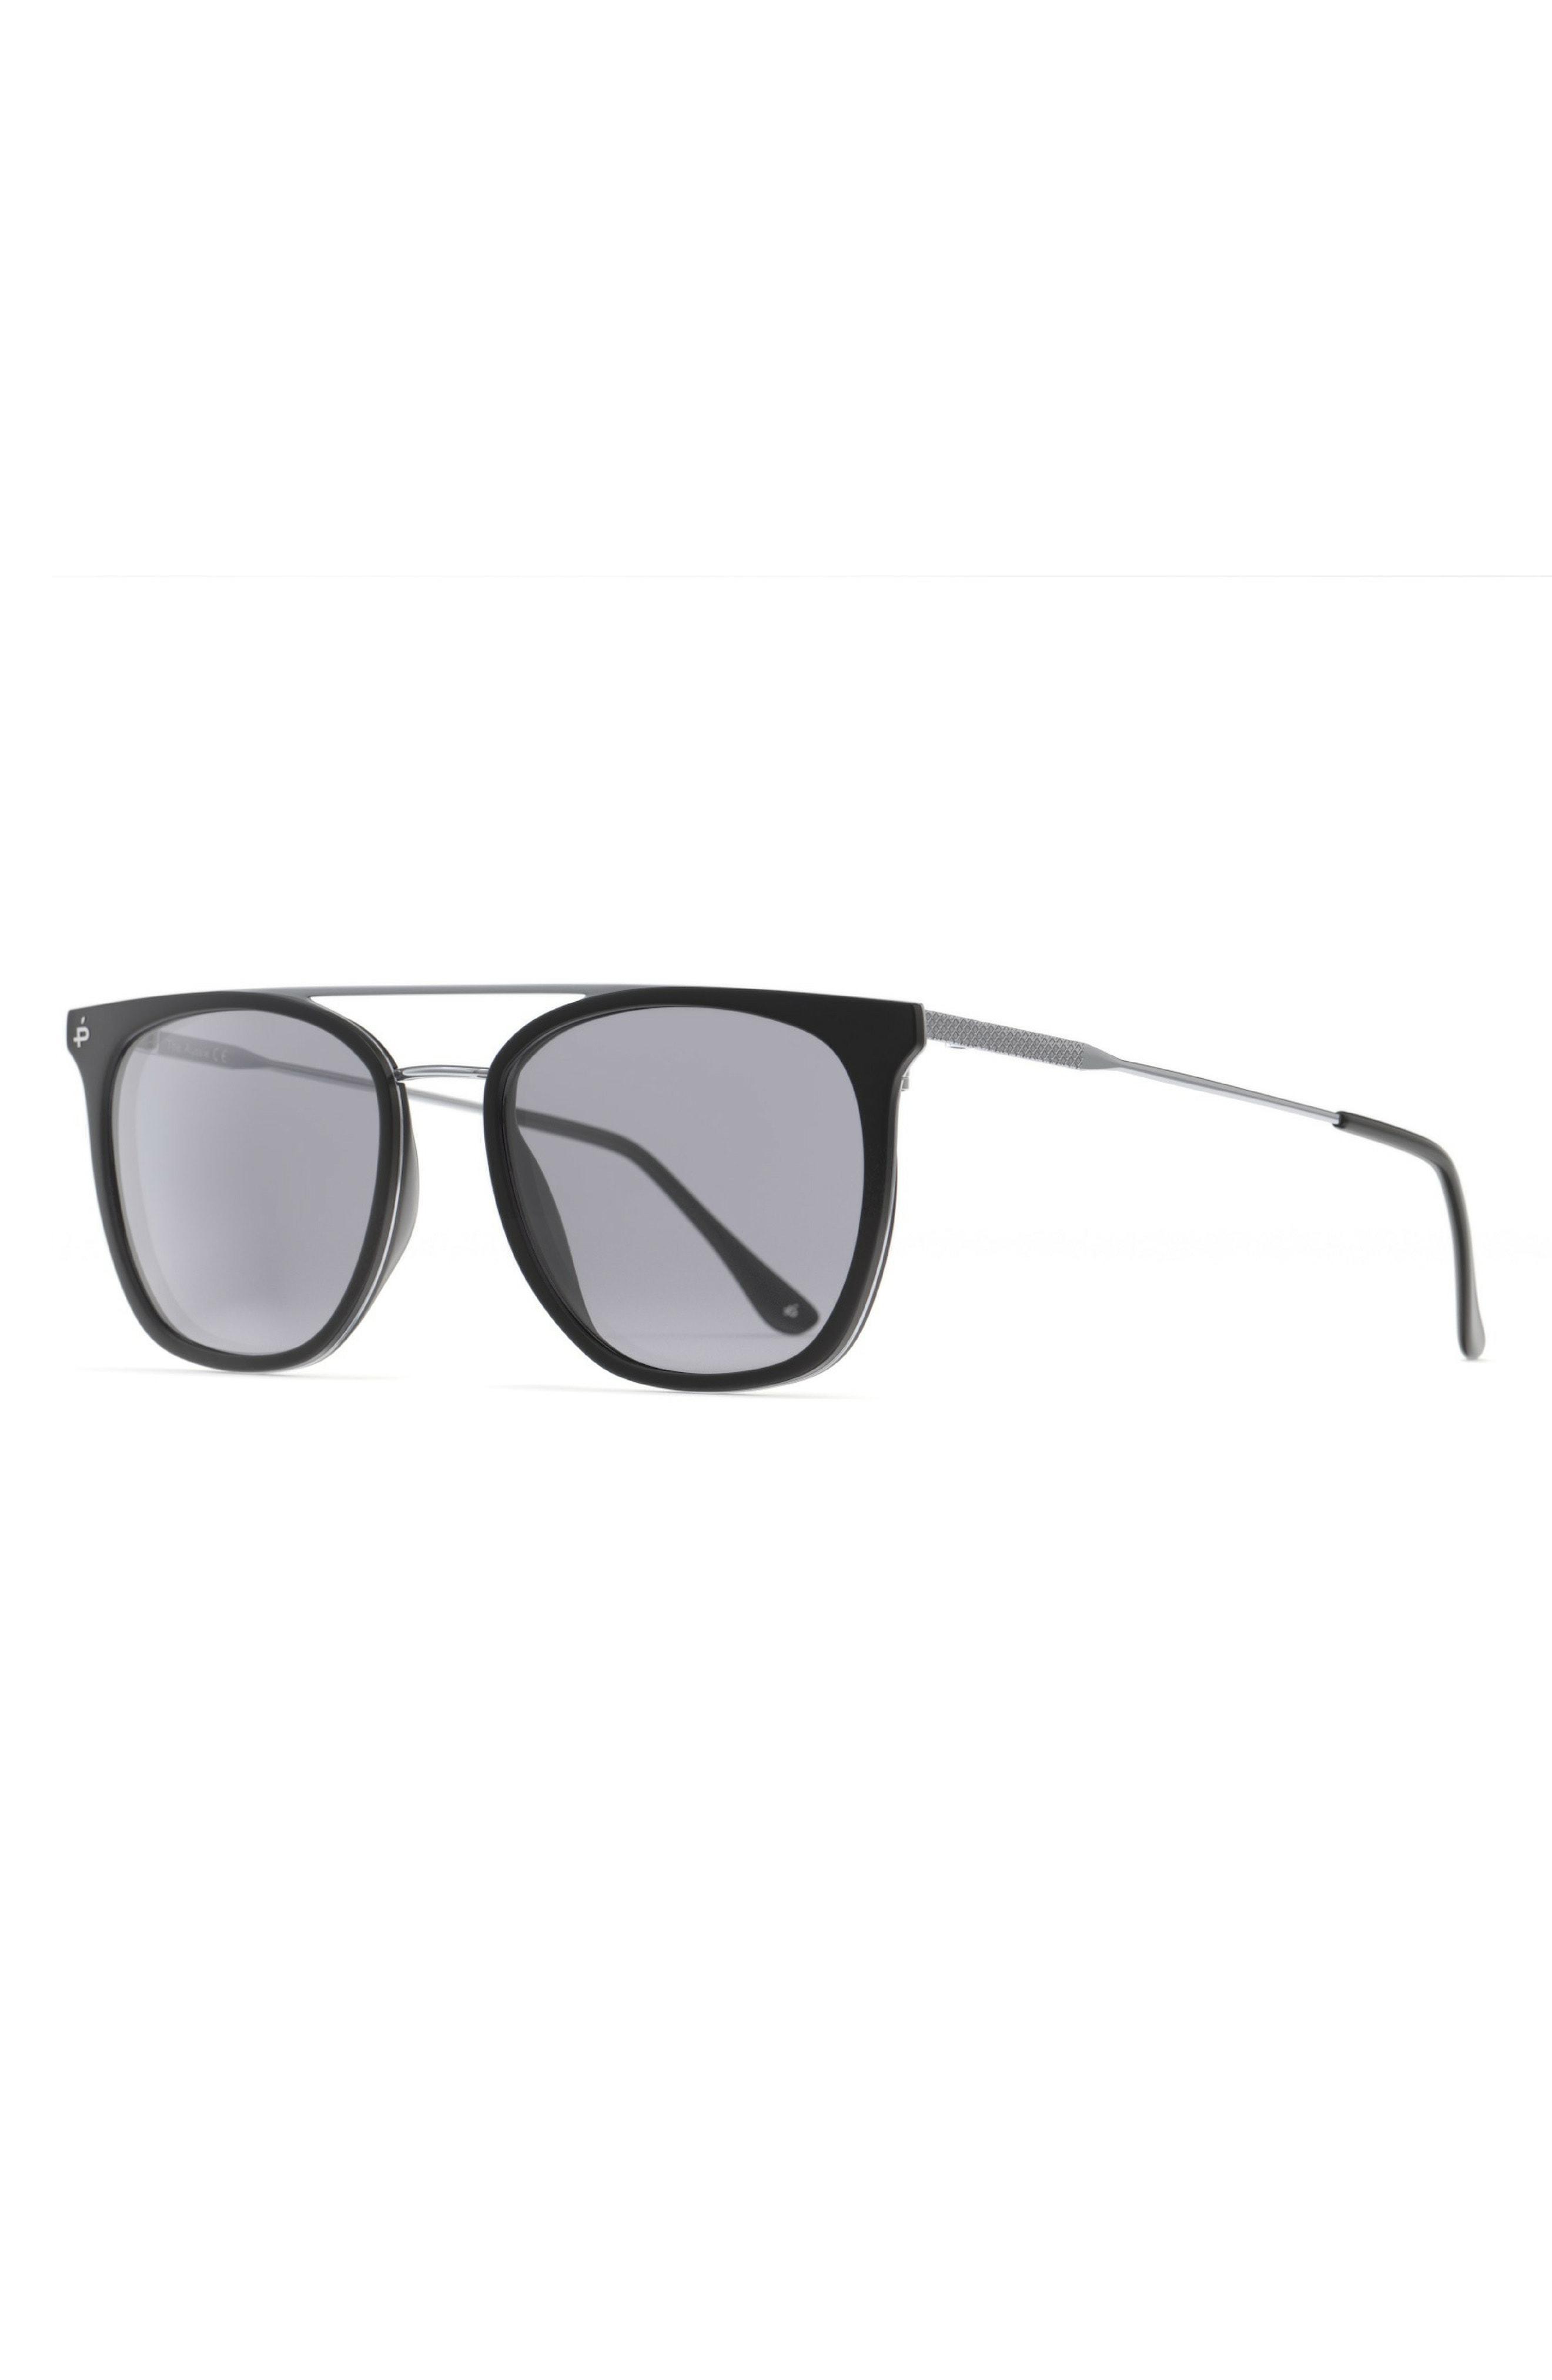 1e643aefae53b Lyst - Privé Revaux The Aussie 54mm Polarized Sunglasses in Black ...